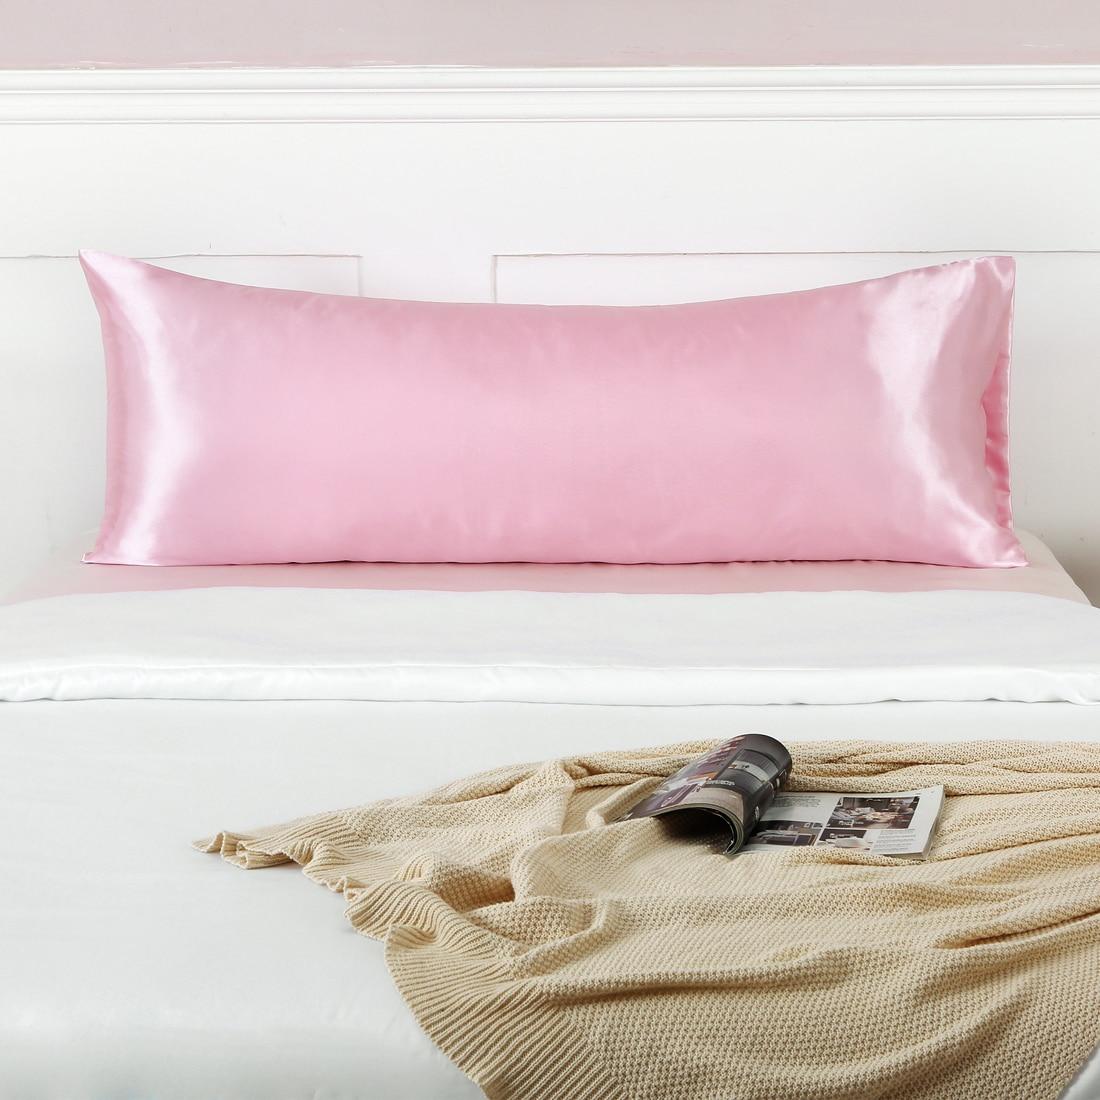 غطاء وسادة ساتان حريري تقليد ، ناعم ومريح ، للجسم ، مع إغلاق مغلف ، طويل ، 51x 137cm